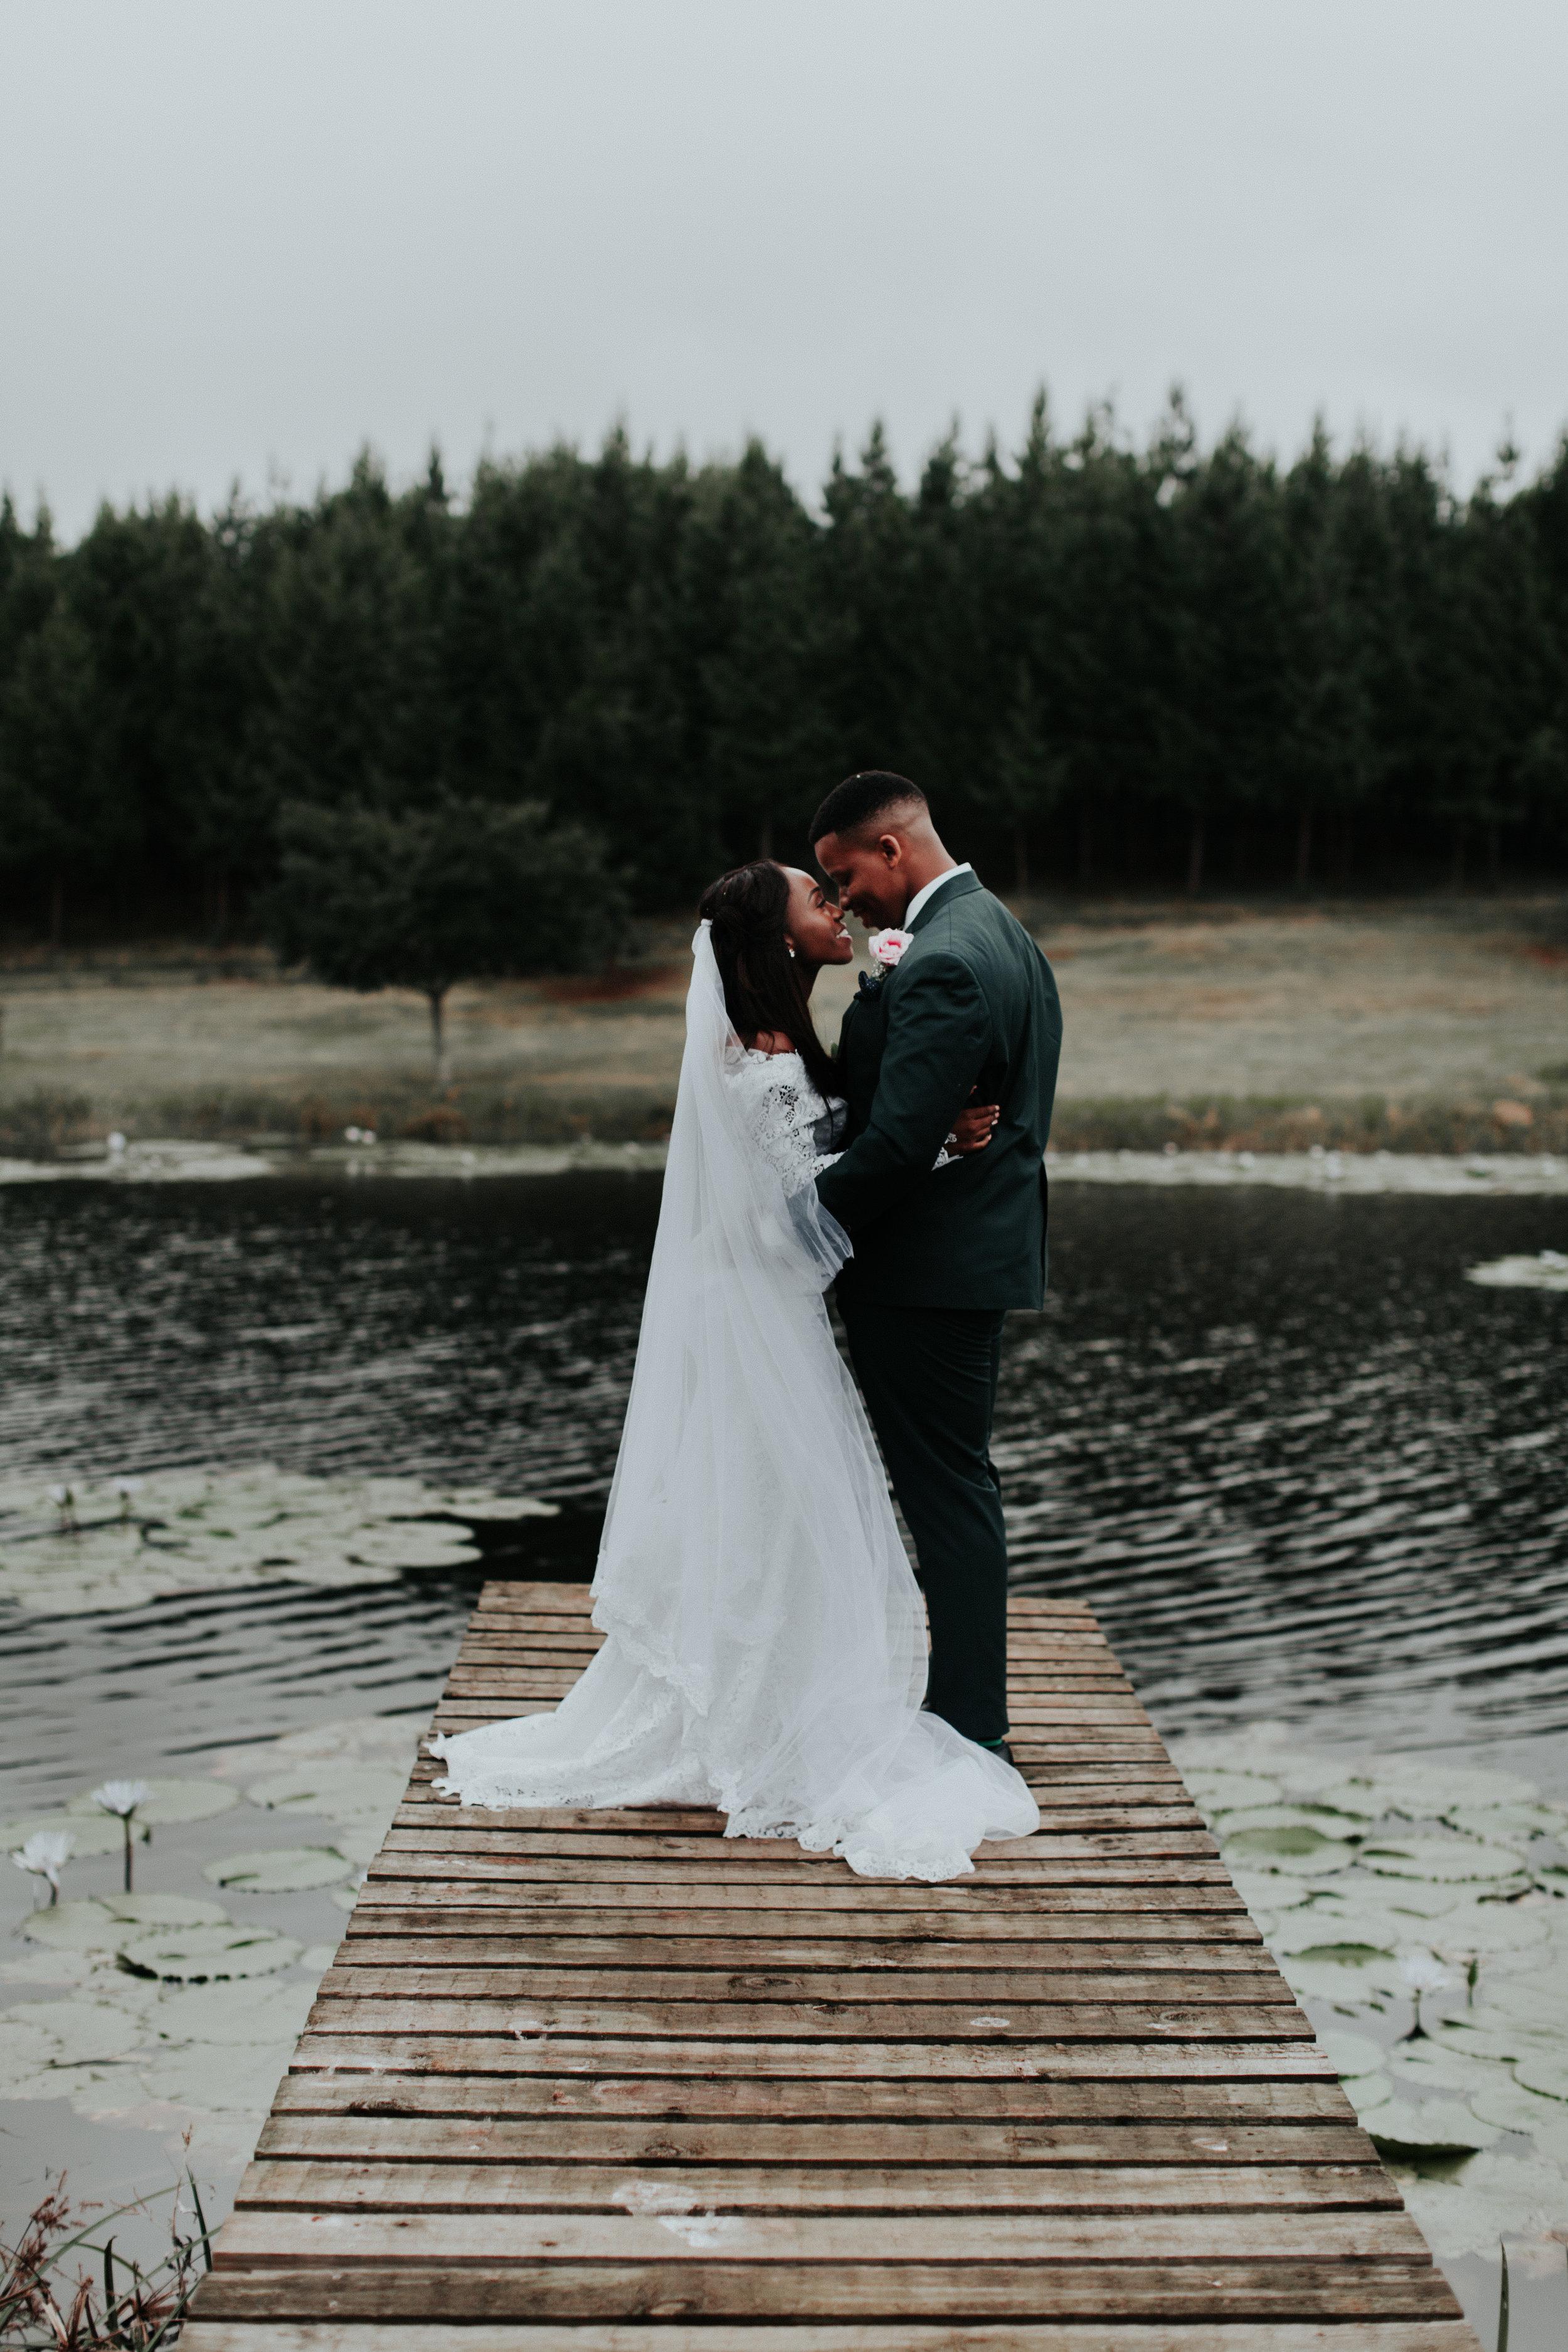 Kristi Smith Photography_Hloni&Nonto_ Wedding Photographer 21.jpg